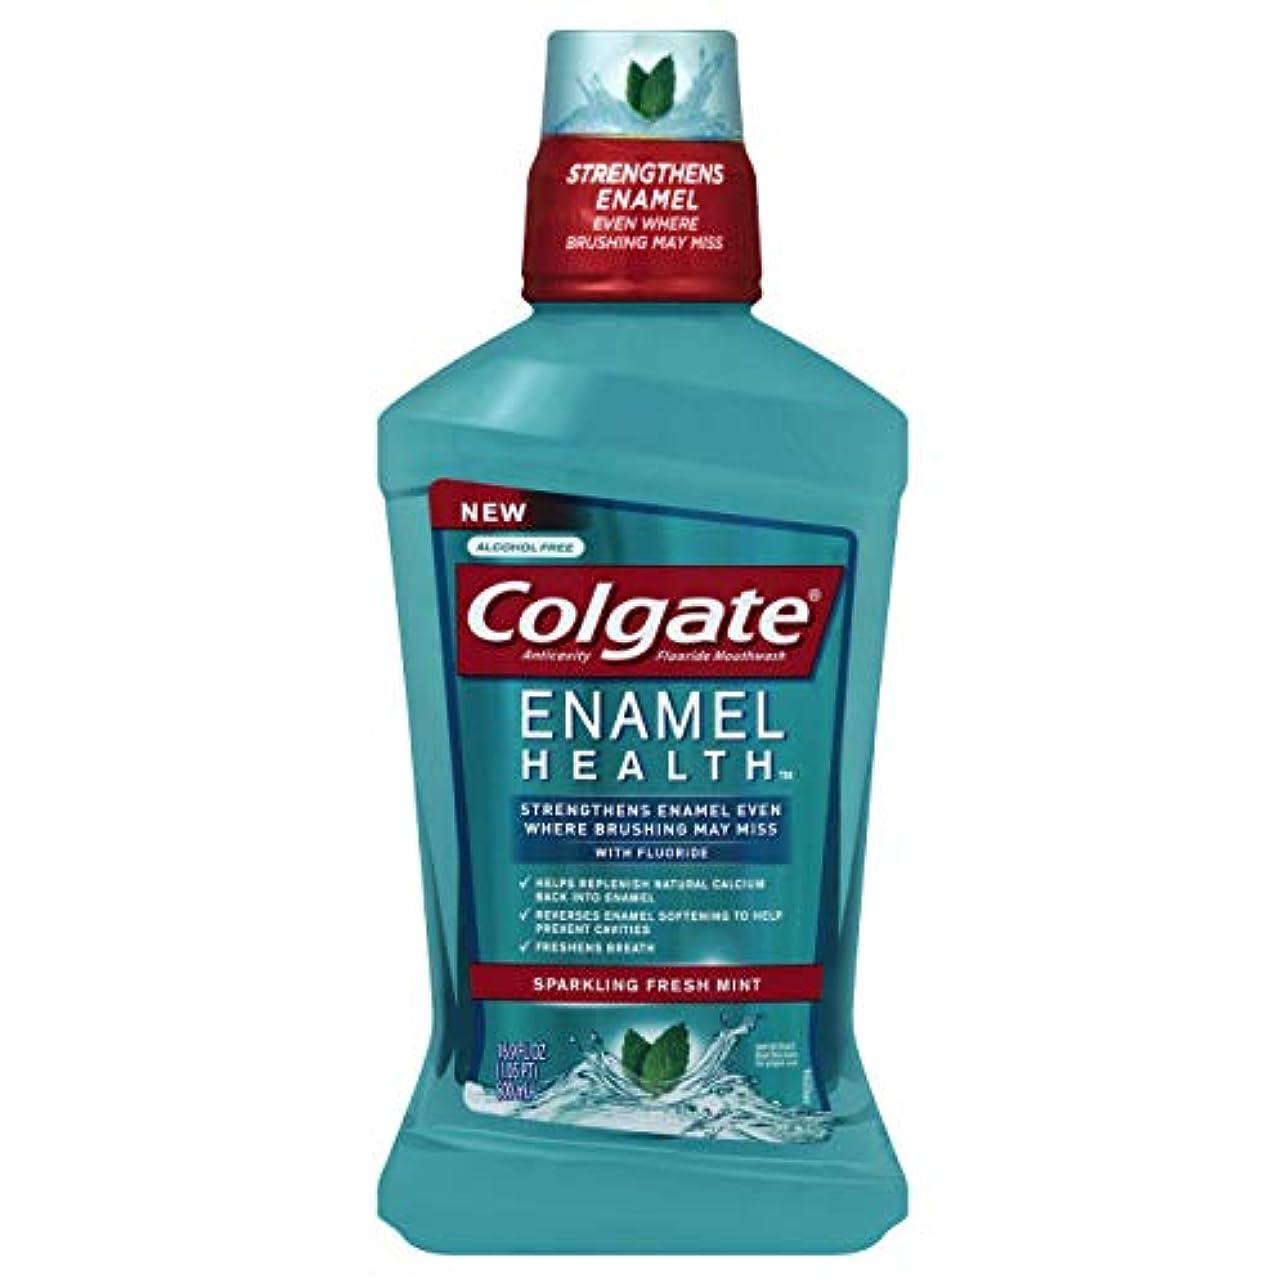 Colgate エナメル健康スパークリングフレッシュミント虫歯予防フッ素うがい薬、500ミリリットル - 6パック